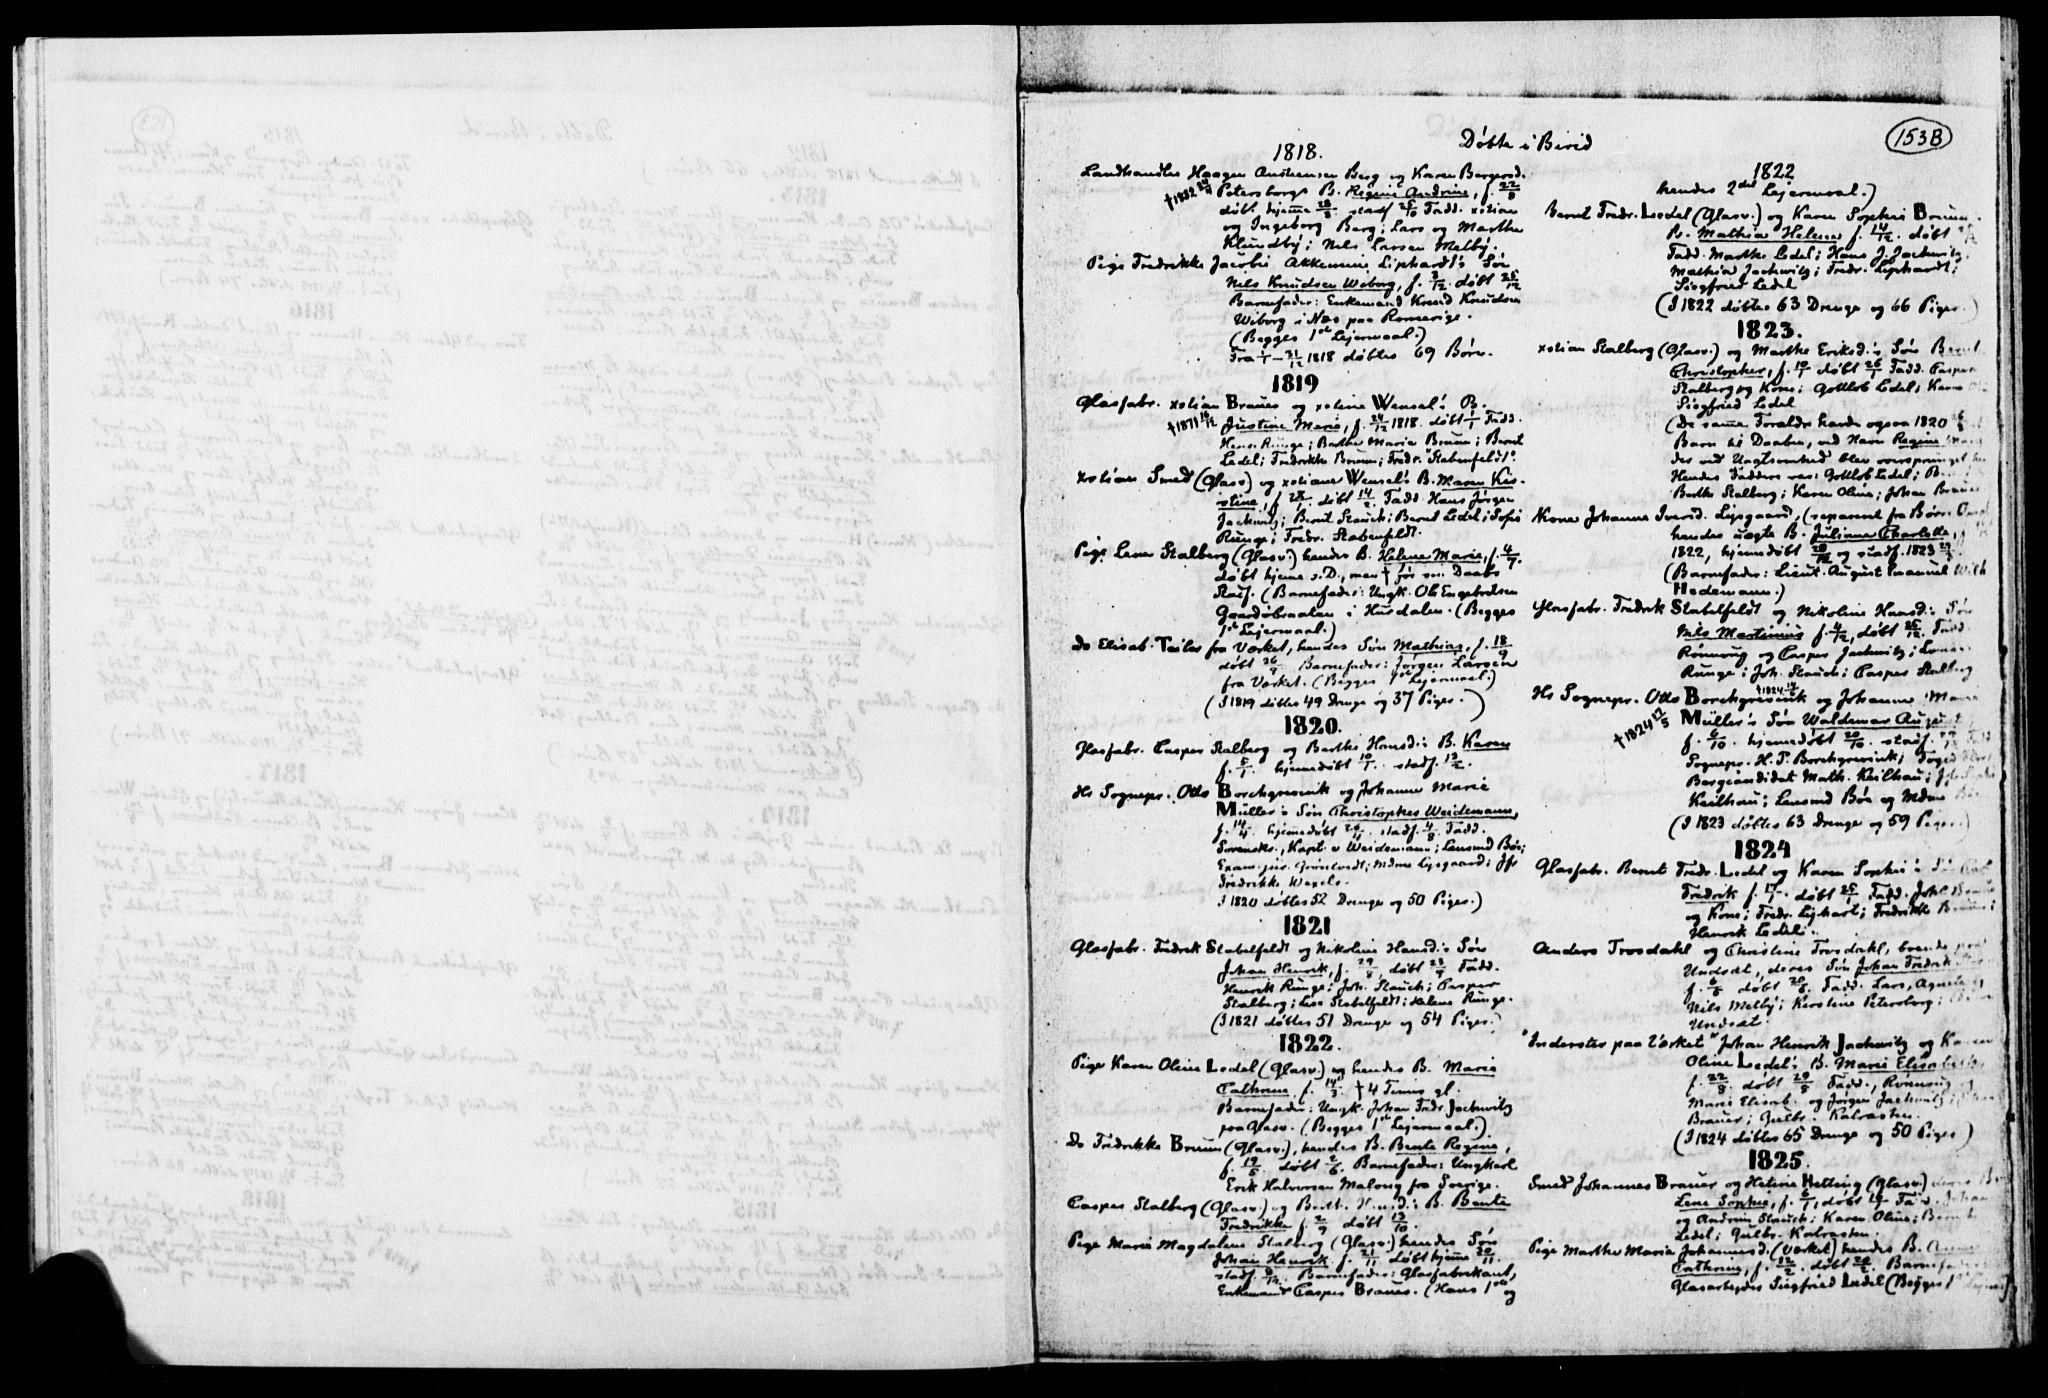 SAH, Biri prestekontor, Ministerialbok, 1730-1879, s. 153b